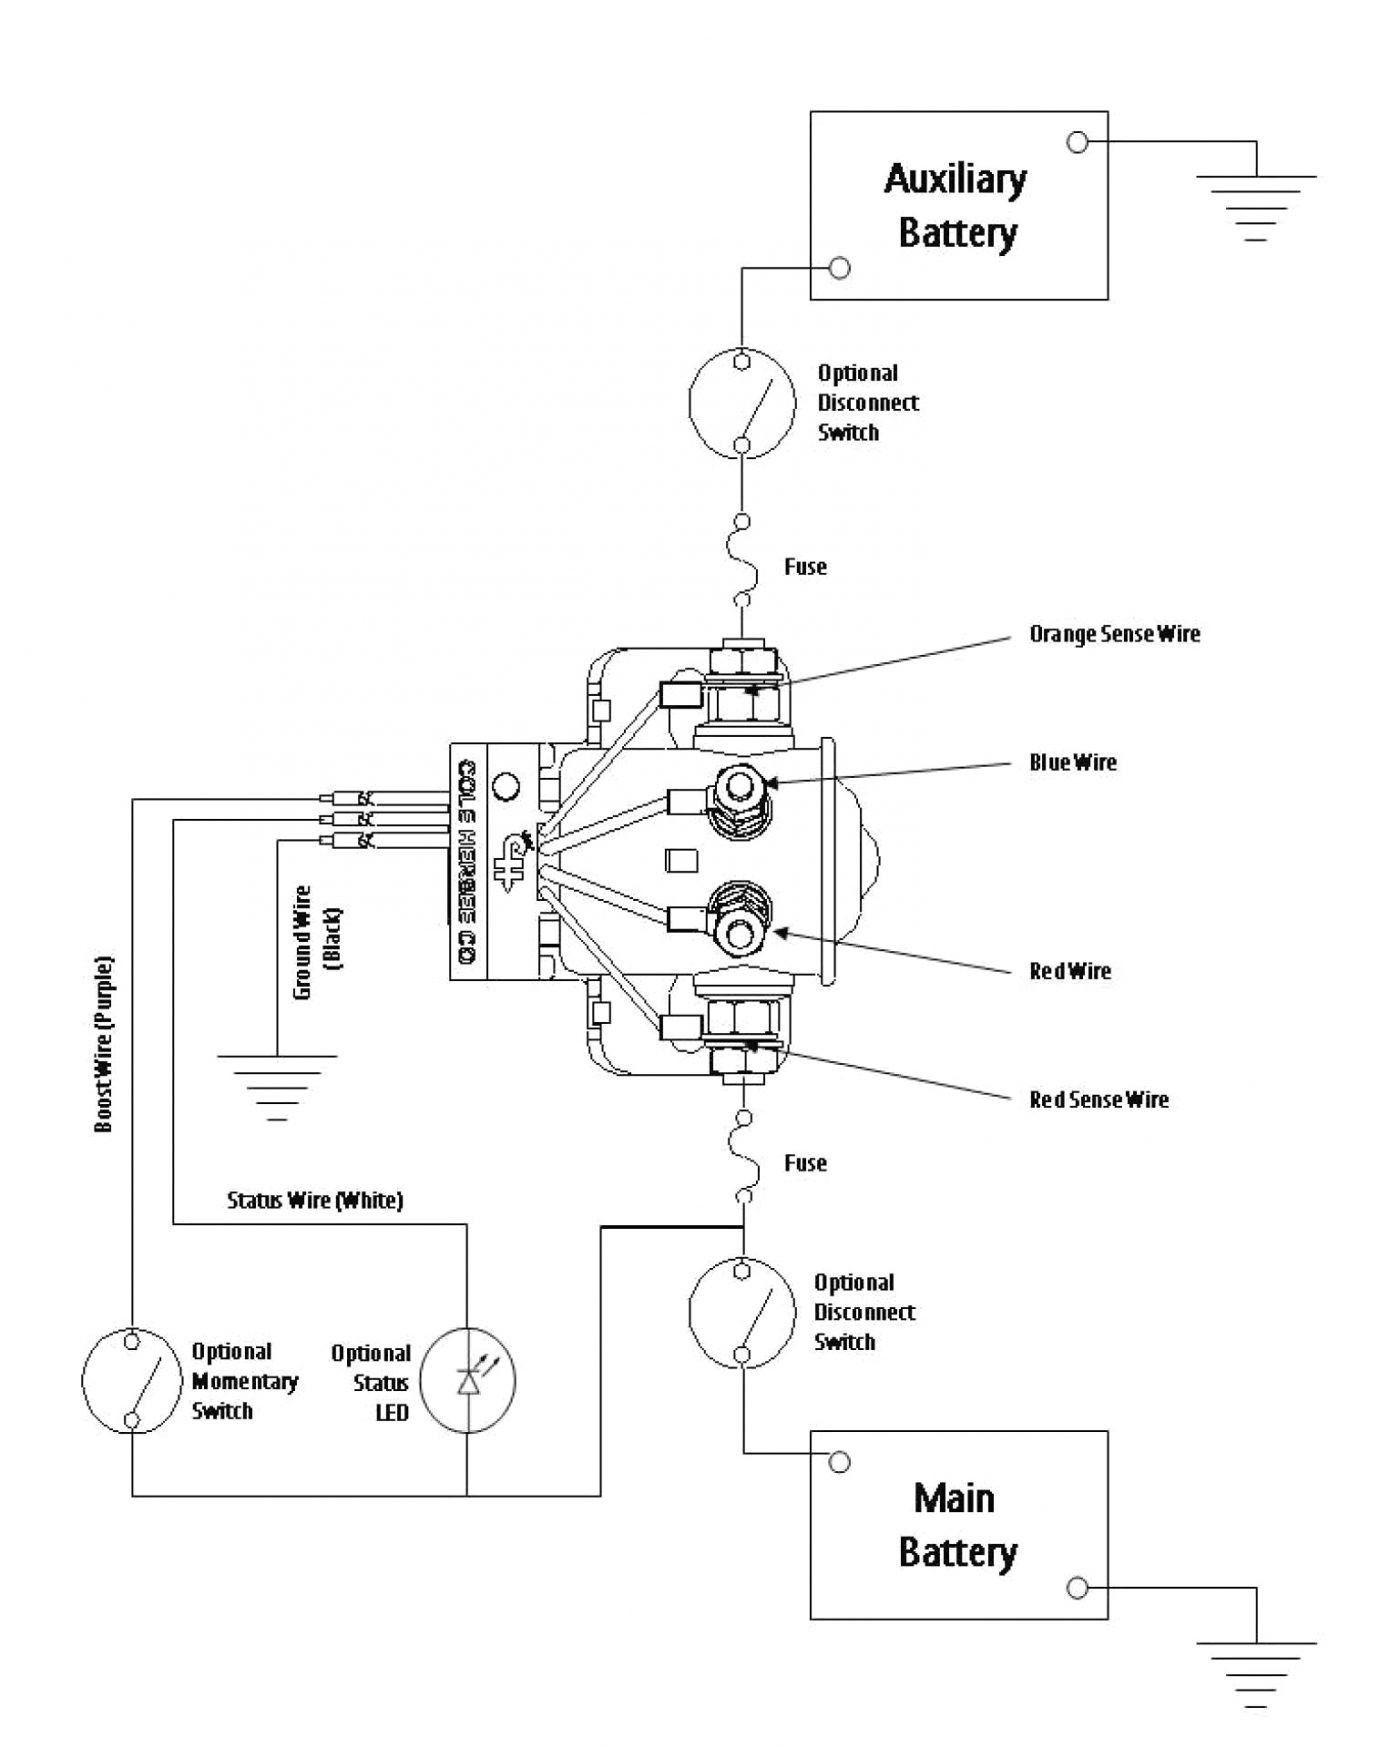 Perko Dual Battery Switch Wiring Diagram 2018 Wiring Diagram In 2020 Electrical Wiring Diagram Boat Wiring Alternator